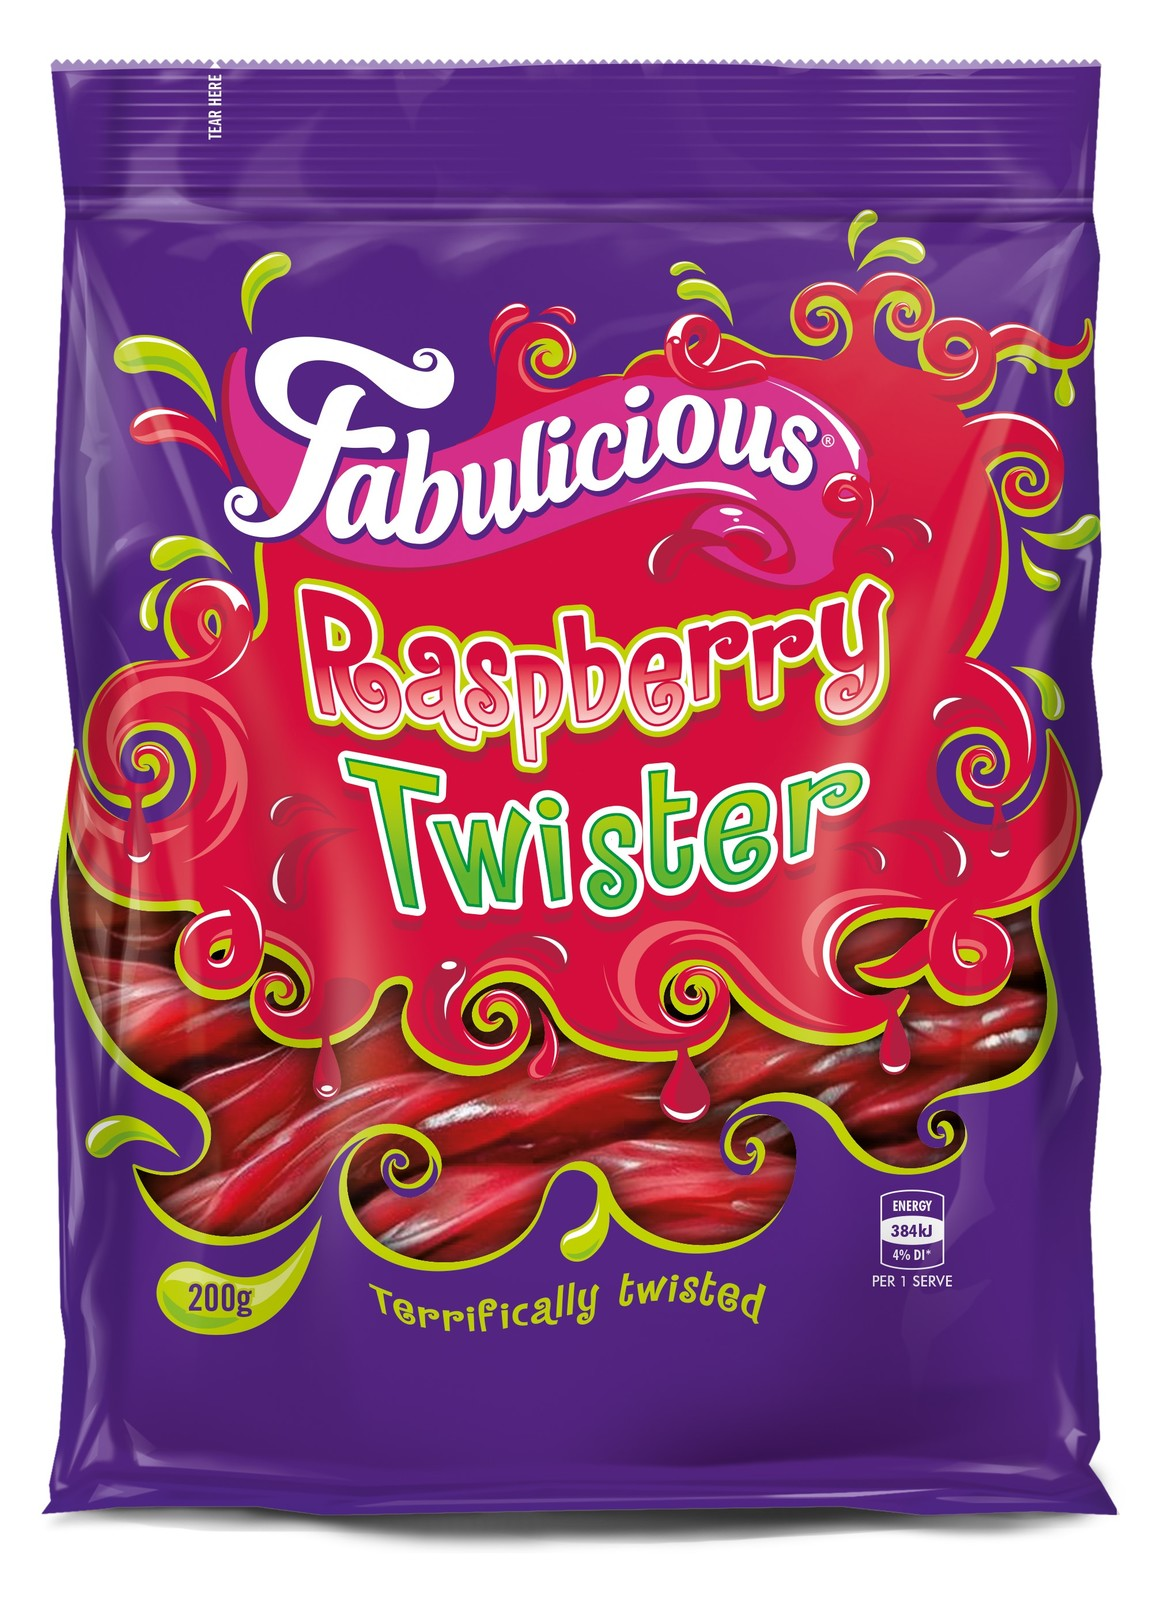 RJs Fabulicious Raspberry Twister (200g) image